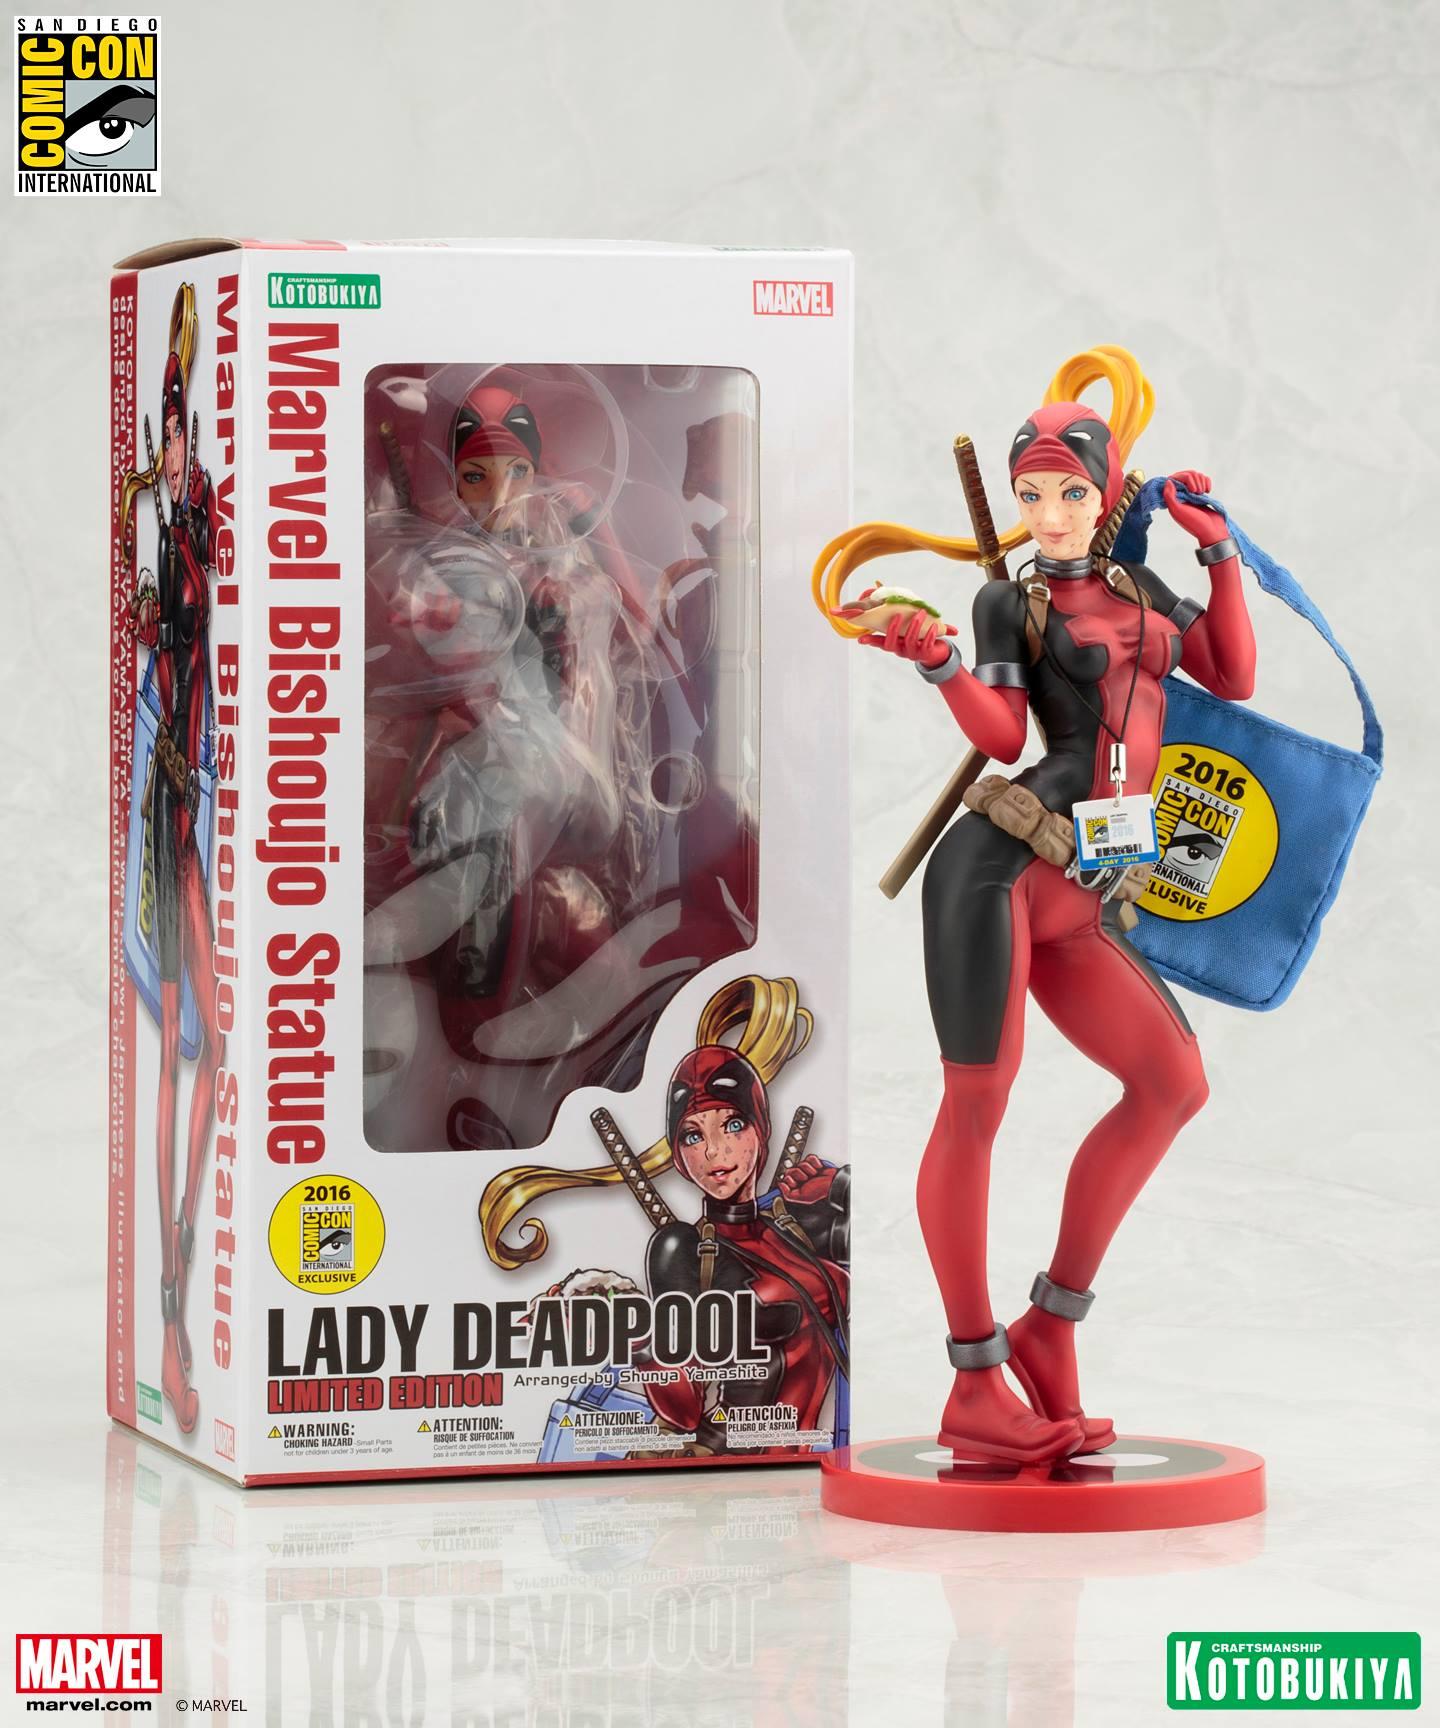 lady-deadpool-2016-sdcc-exclusive-bishoujo-statue-kotobukiya-marvel-12